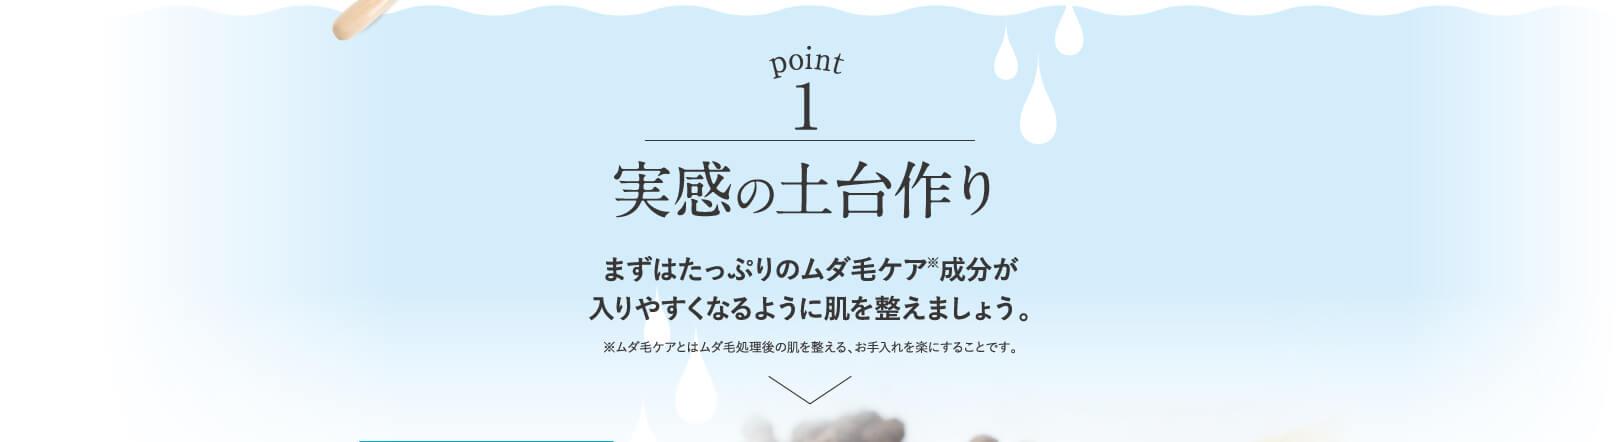 point1 実感の土台作り